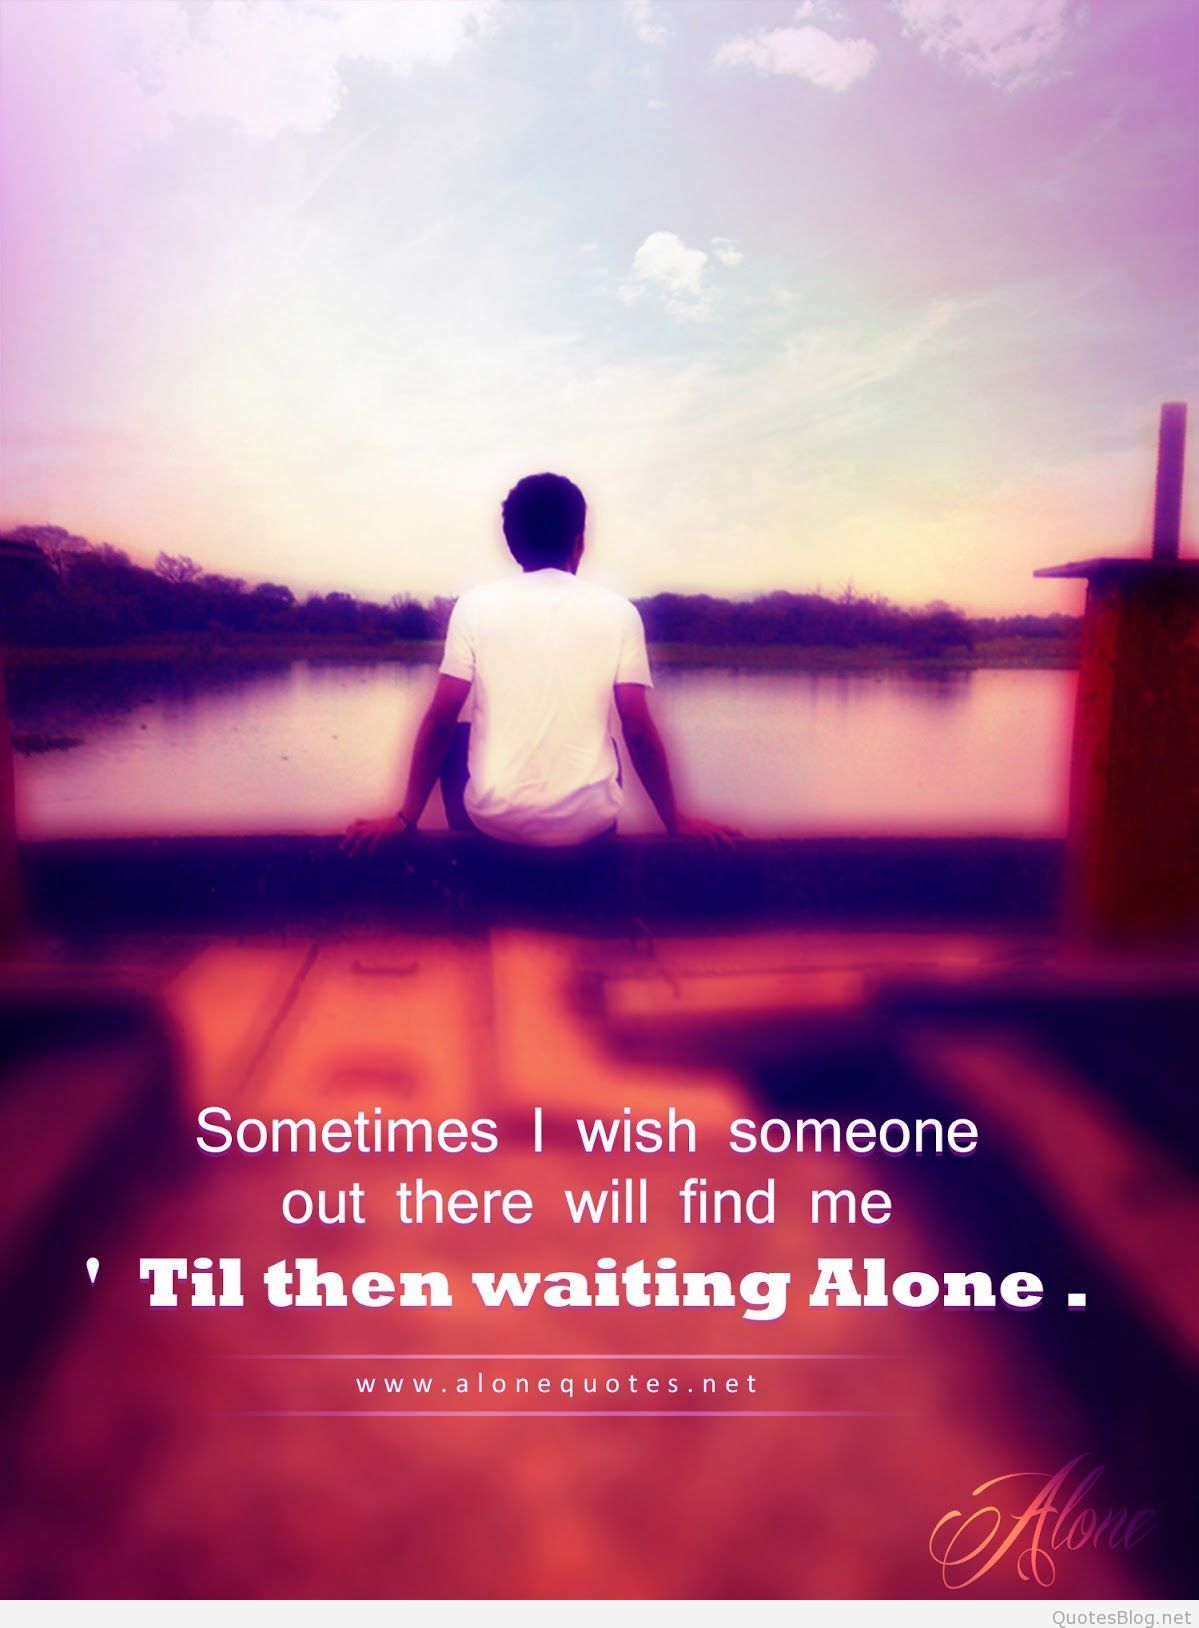 sad-love-quotes-for-boys-sad-alone-boy-love-quotes-wallpaper-download-sad-alone-boy-love-cool ...